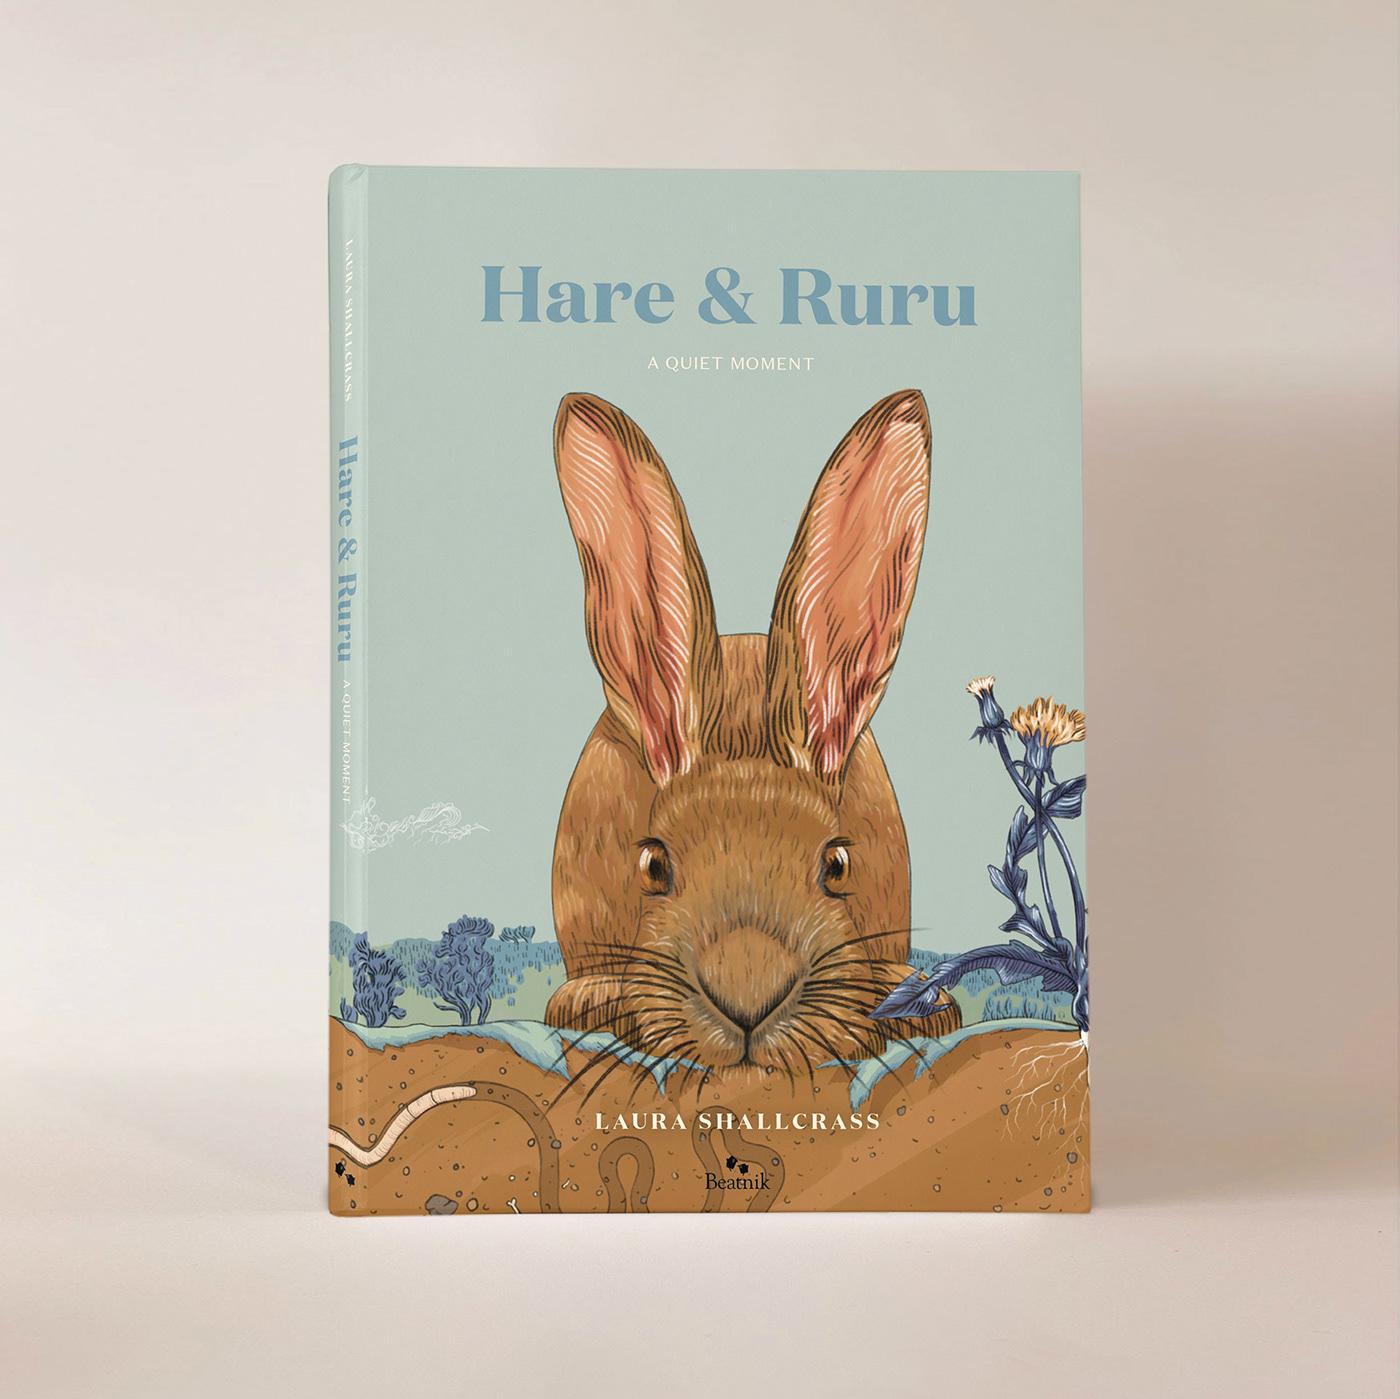 animals childrens book childrensbookillustration hare ILLUSTRATION  kidsillustration Nature newzealand picturebook ruru